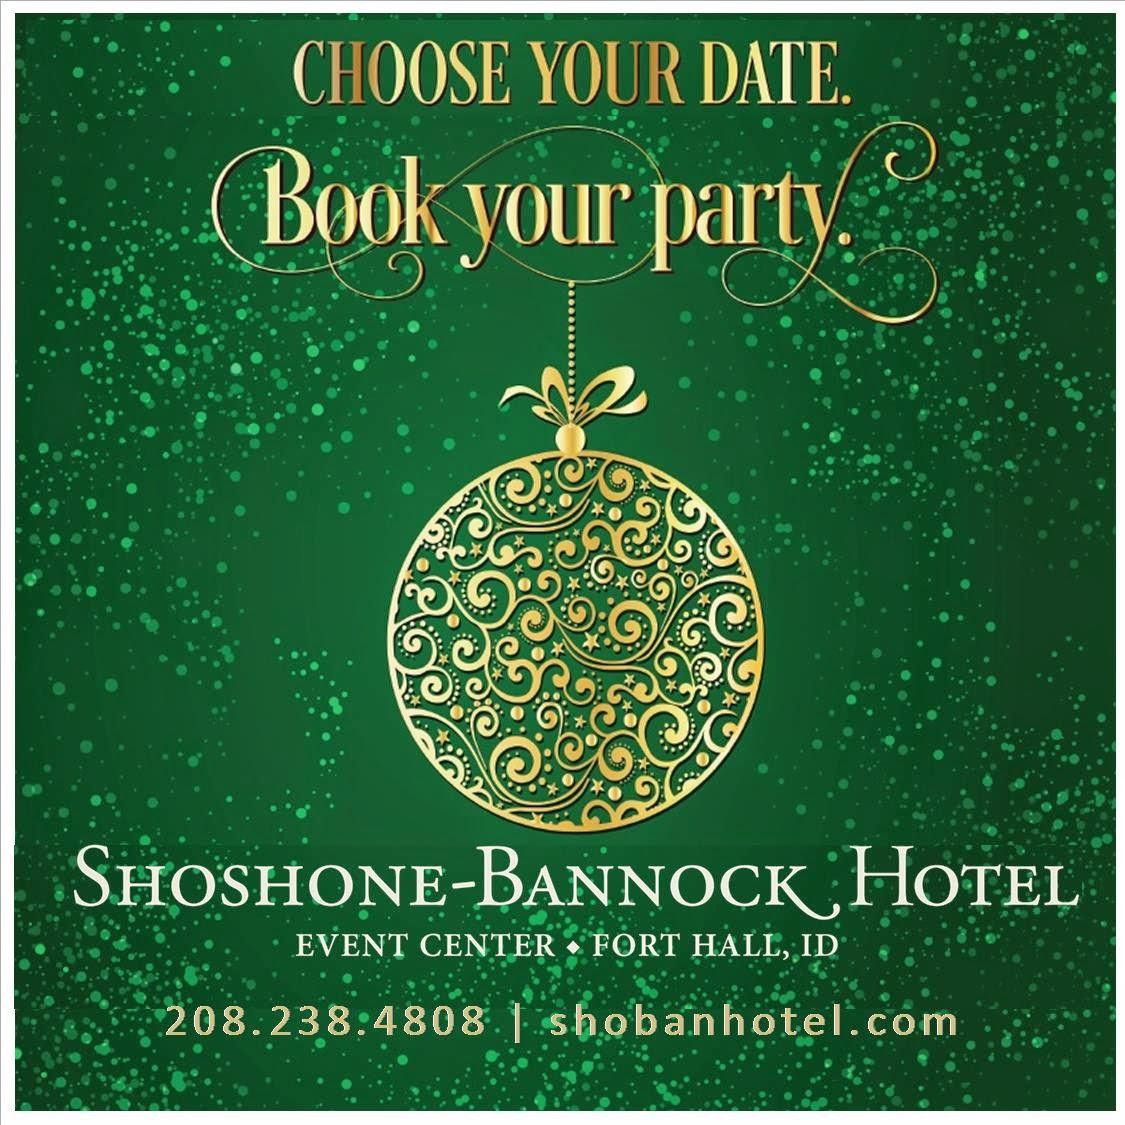 Shoshone-Bannock Hotel